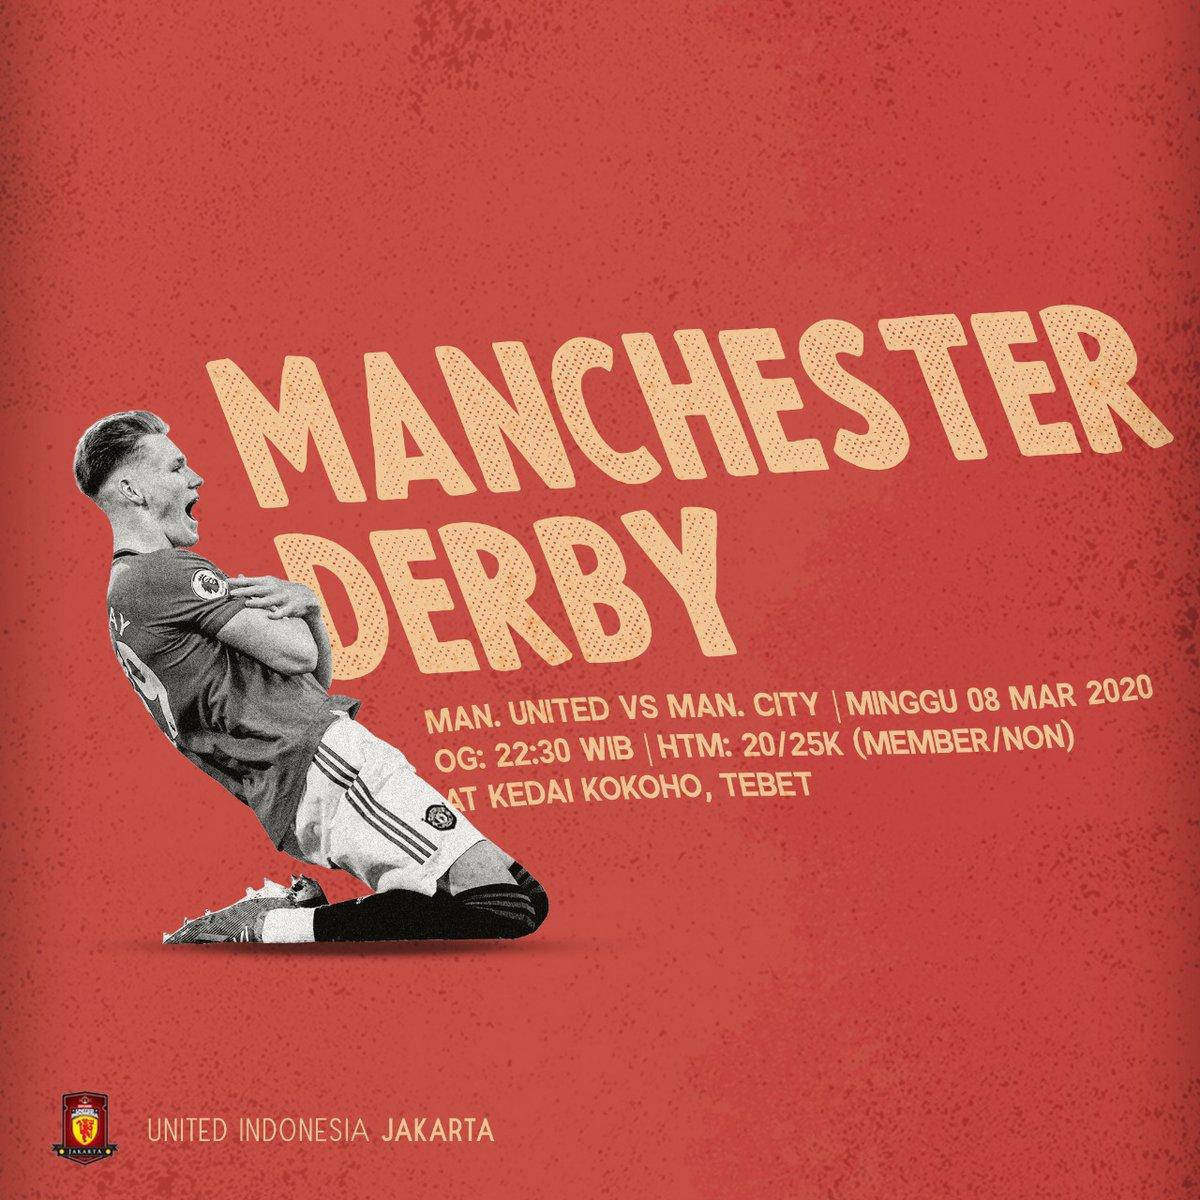 #LiveScreening malam ini!  Manchester Derby! Live at Kedai Kokoho Tebet, Open Gate jam 22.30, htm? 20/25 untuk member dan non member, see you guys!   #UIJKT https://t.co/TISS8DmSMi